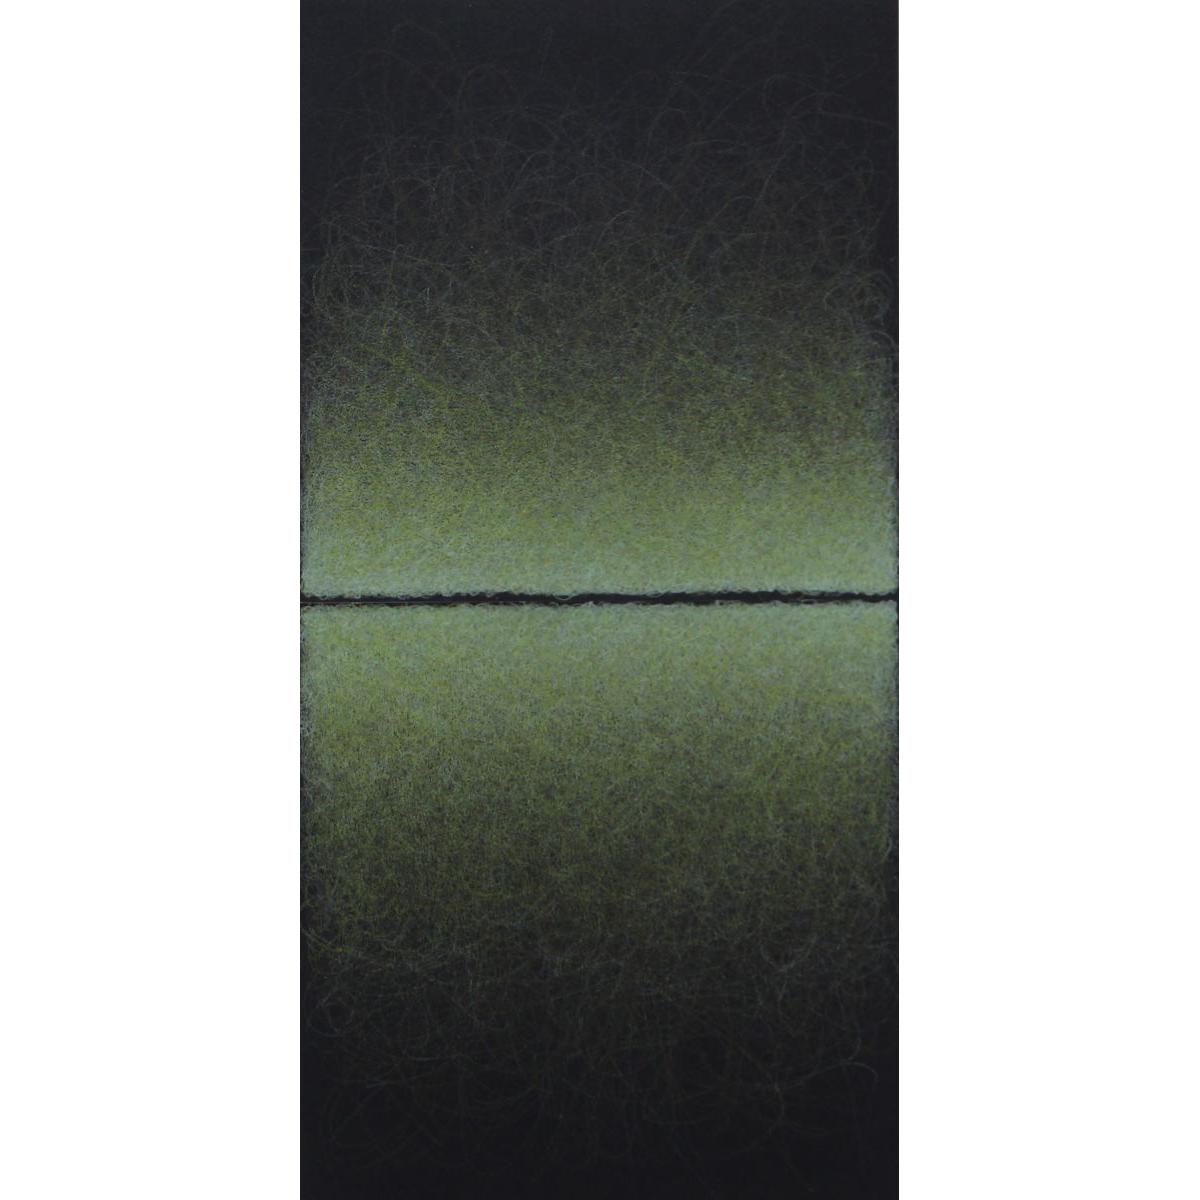 Quantum Entanglement (Yellow Green Diptych)